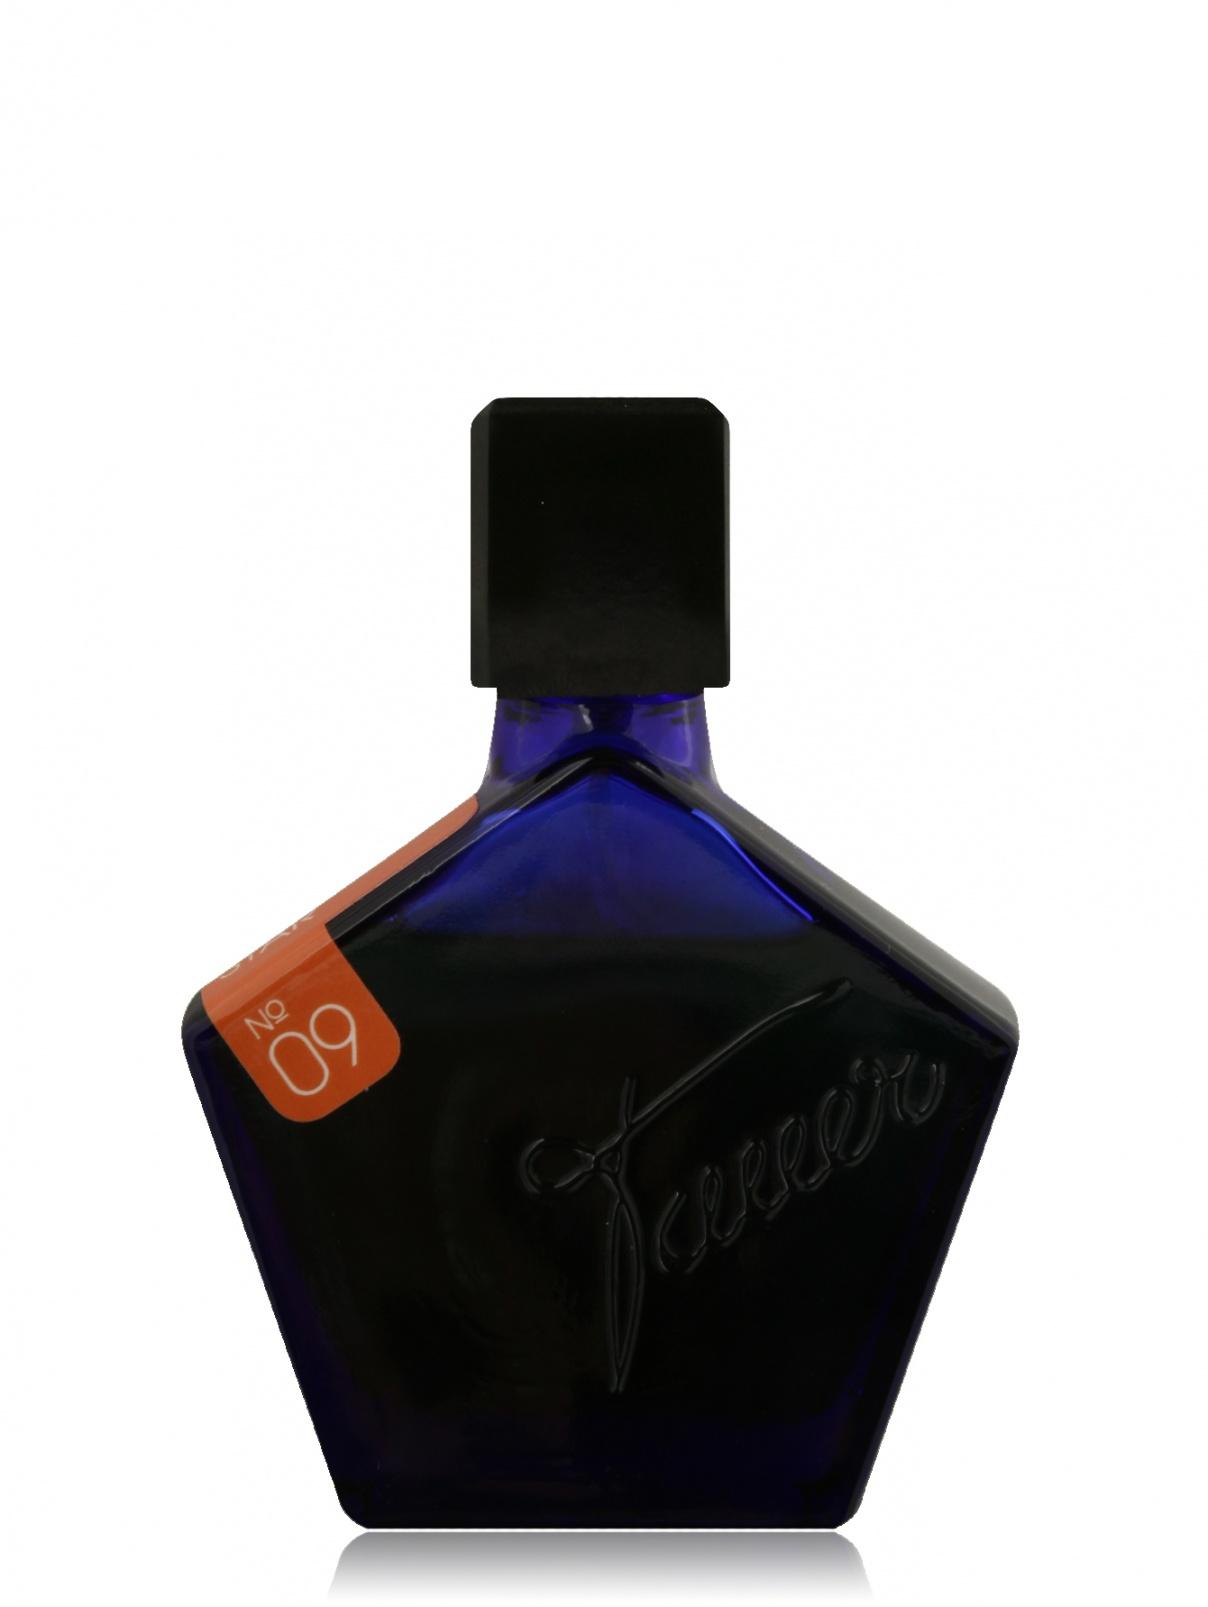 Парфюмерная вода 50 мл 09 Orange Star Andy Tauer Andy Tauer  –  Общий вид